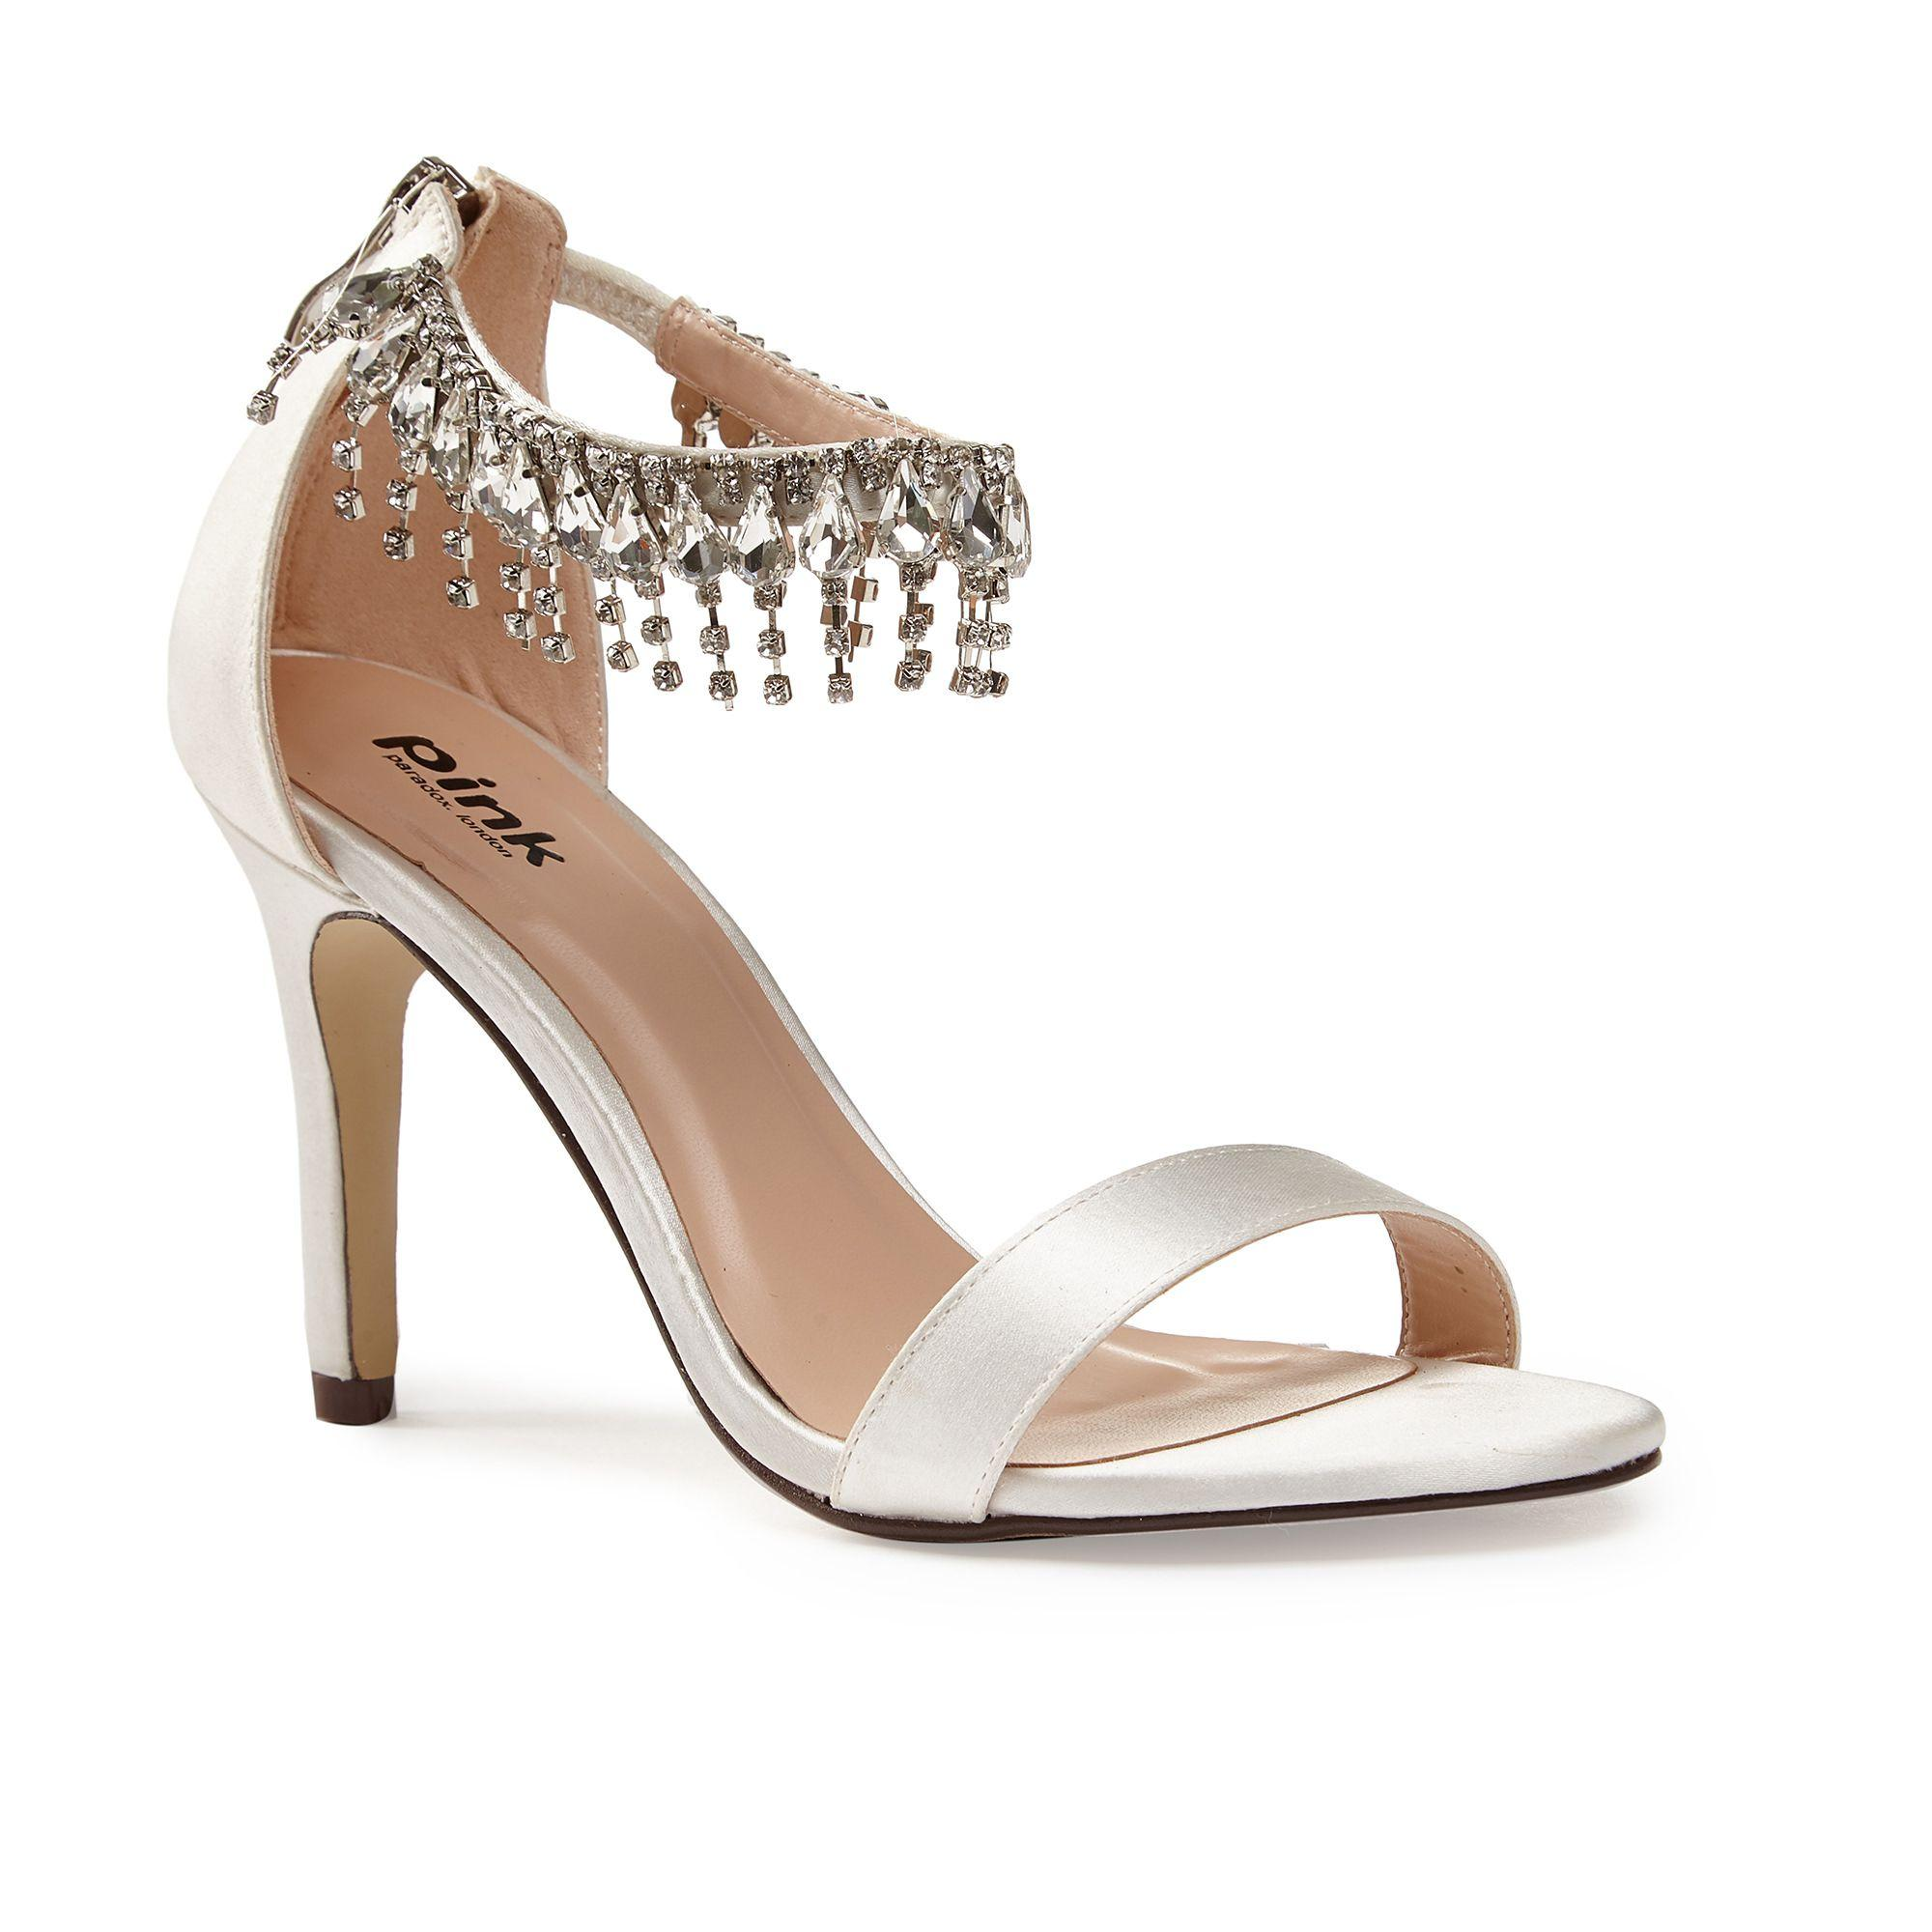 Paradox london pink Tamara Jewel Ankle Strap Satin Sandals | Lyst